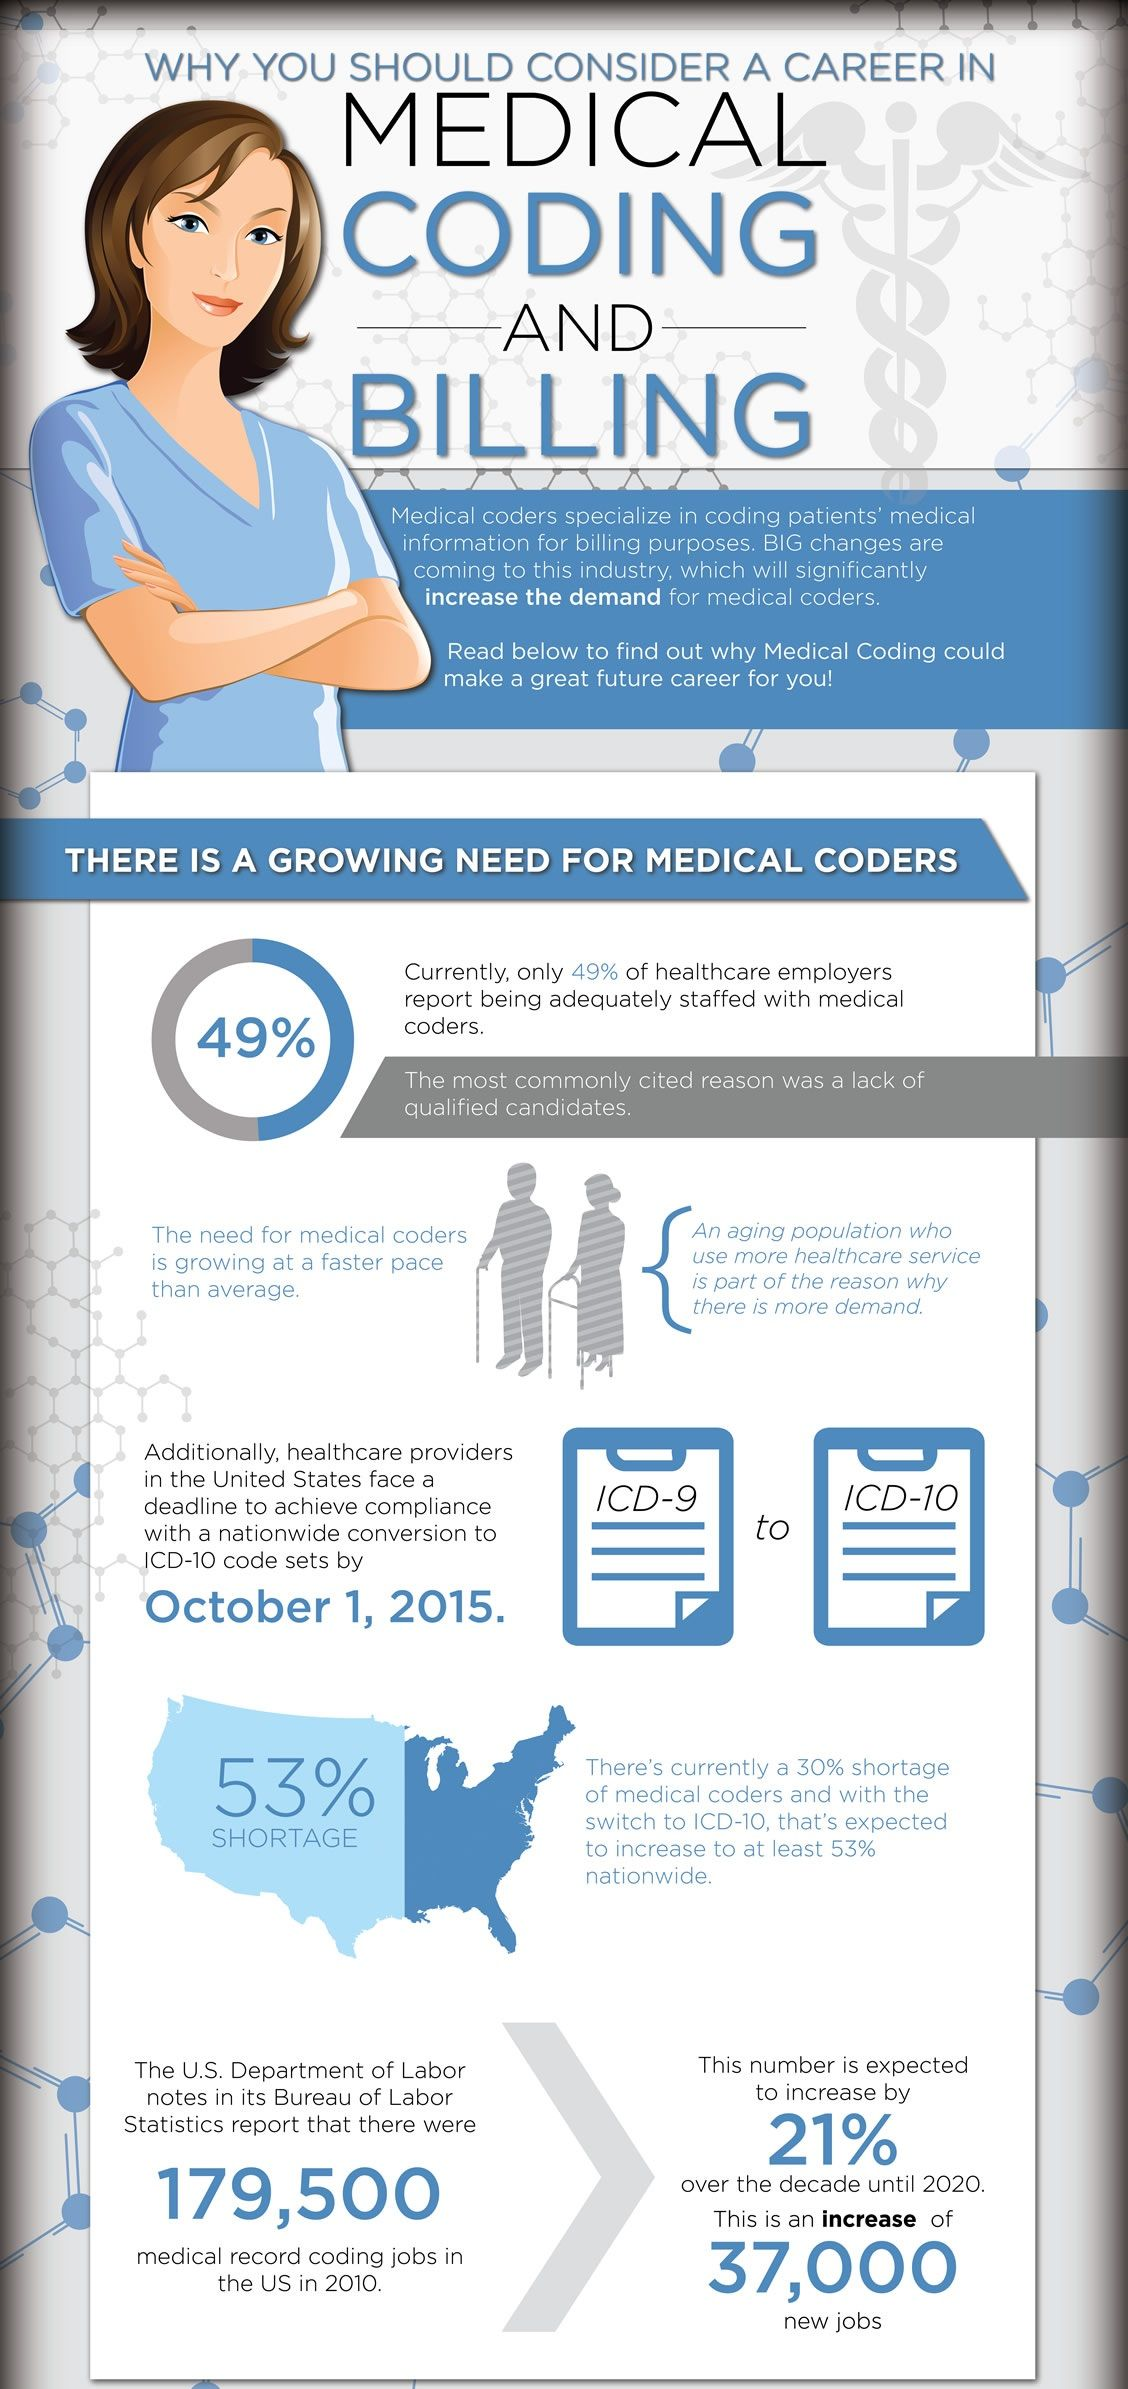 ab0b6171ded77ba5947b345e15a1918d - How Hard Is It To Get A Medical Coding Job